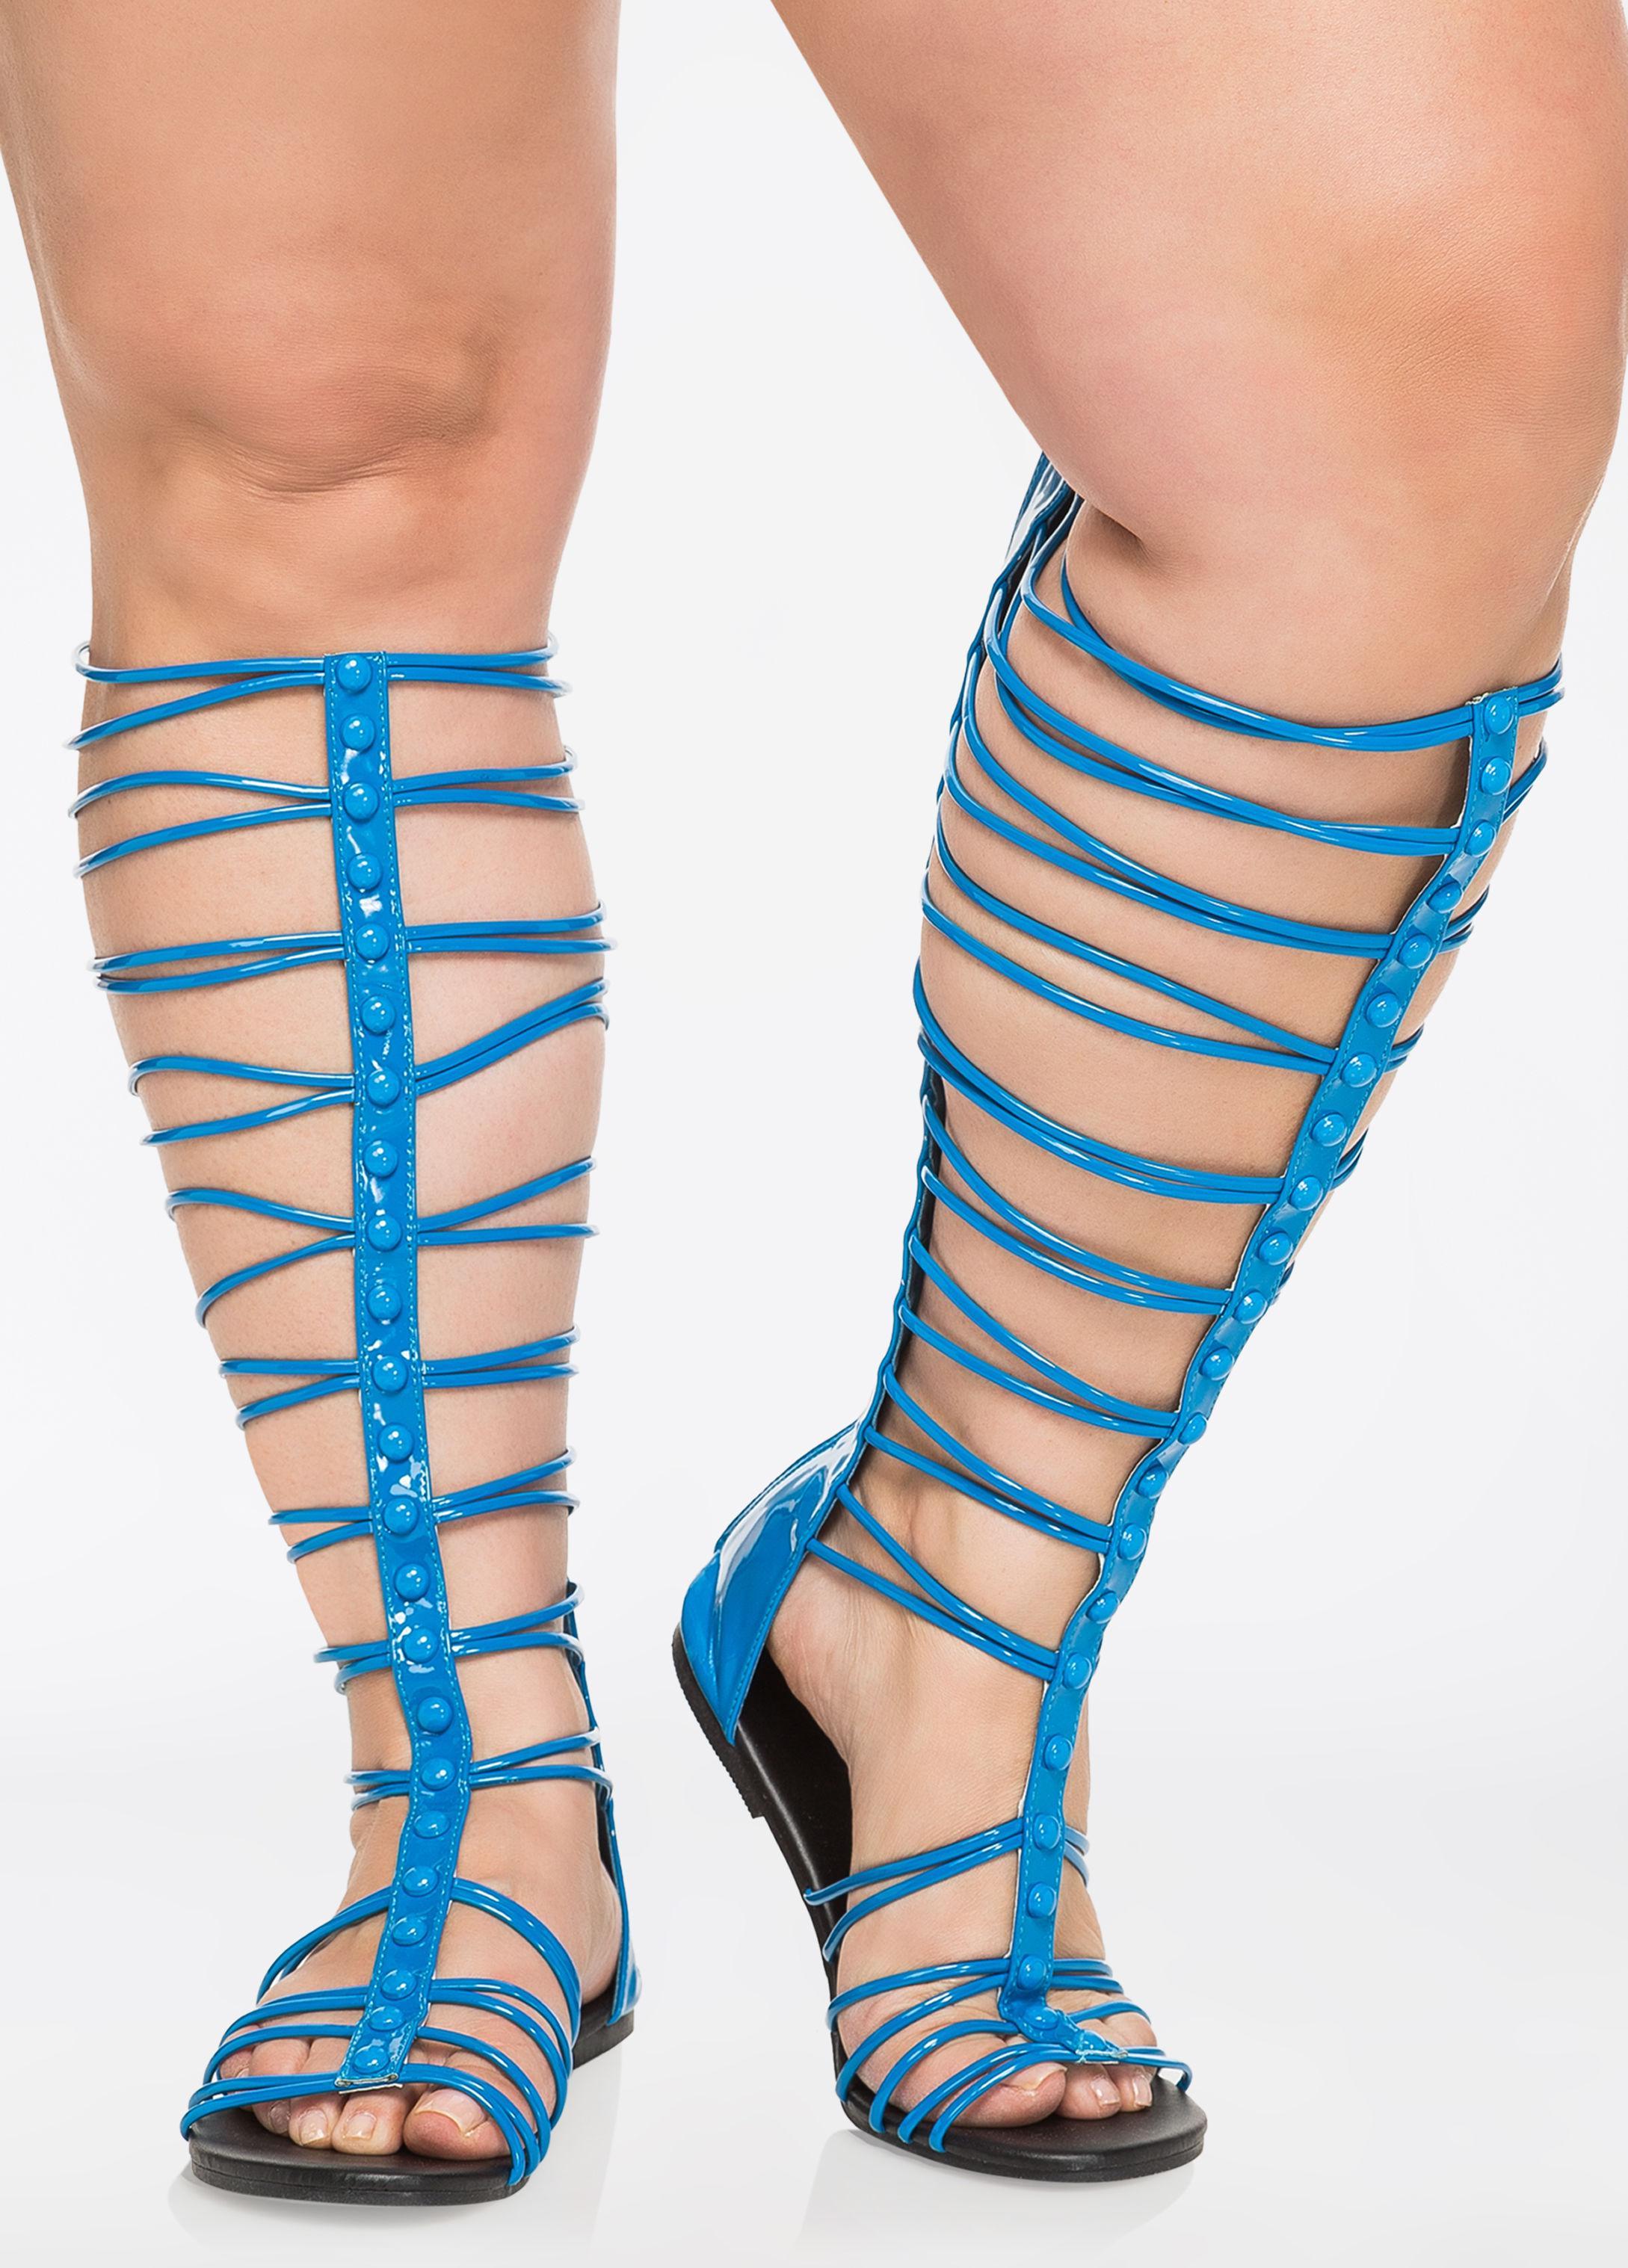 99e56cb558e2 Lyst - Ashley Stewart Ballistic Gladiator Sandals - Wide Width in Blue